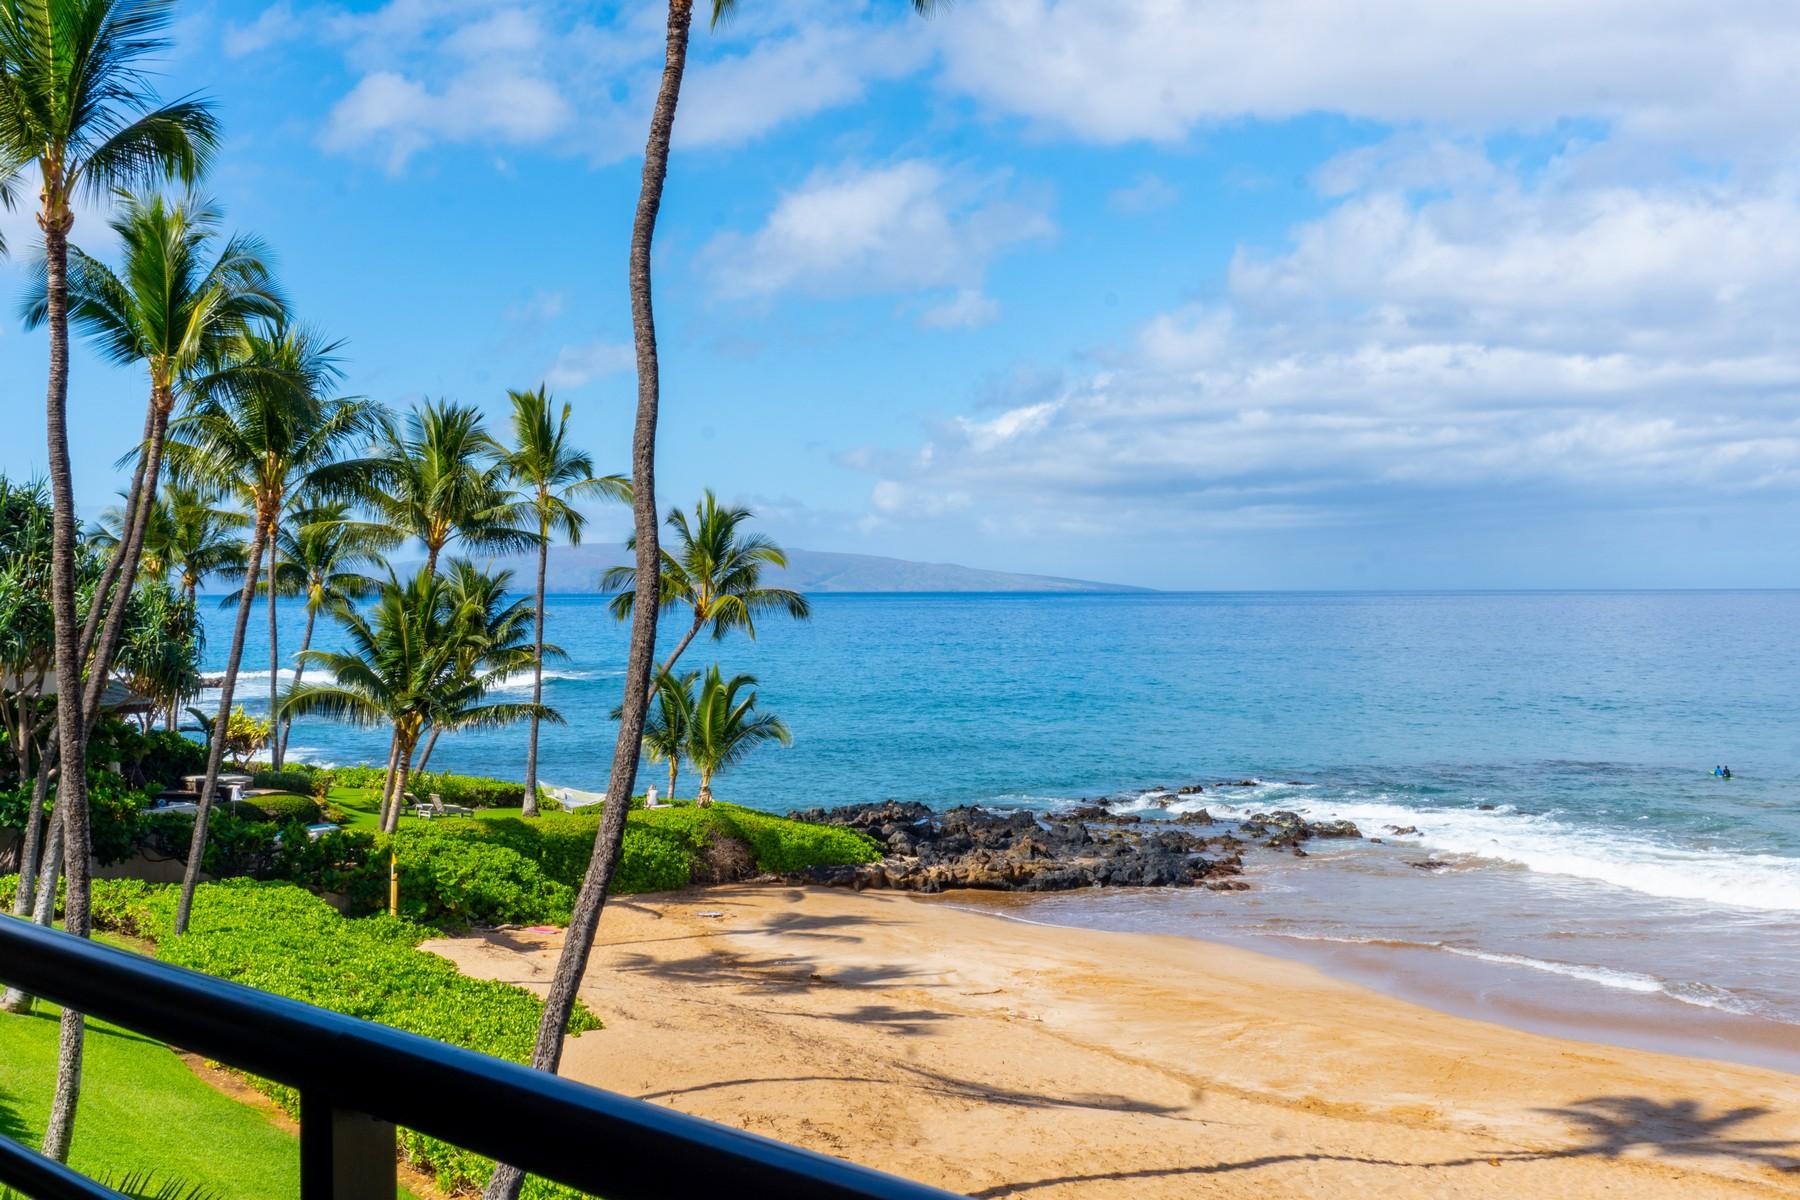 Condominiums 为 销售 在 Polo Beach Club Suite 305 in Wailea-Makena, Maui, HI 4400 Makena Rd, Polo Beach Suite 305 威雷亚, 夏威夷 96753 美国